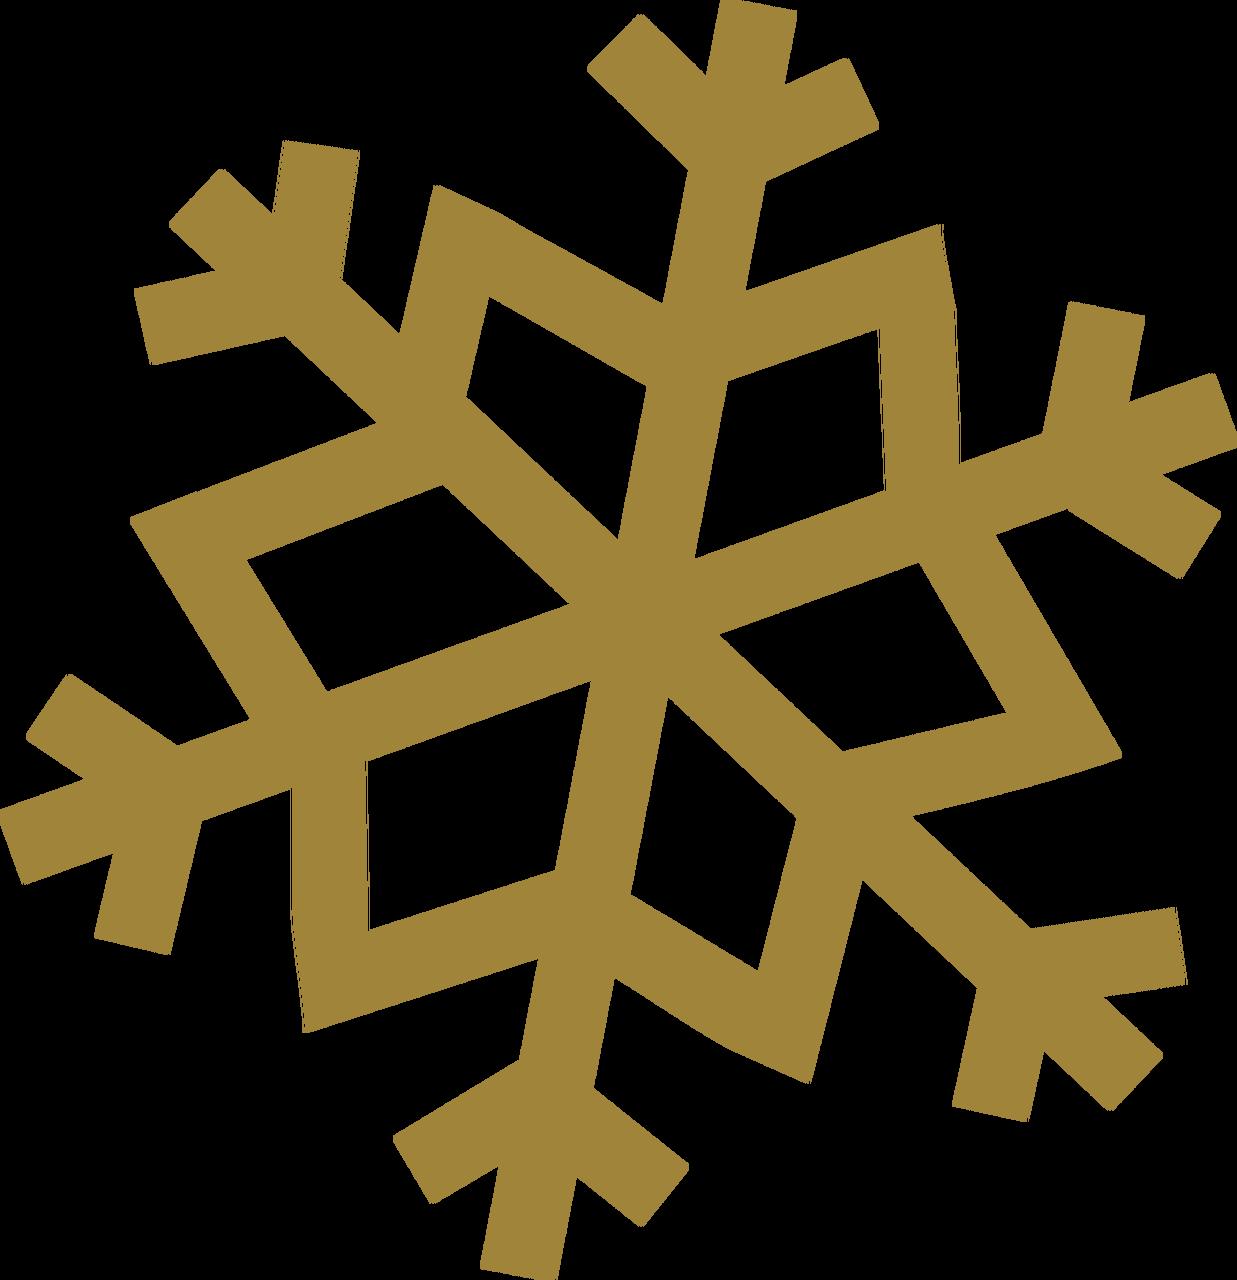 Christmas Snowflake #8 SVG Cut File